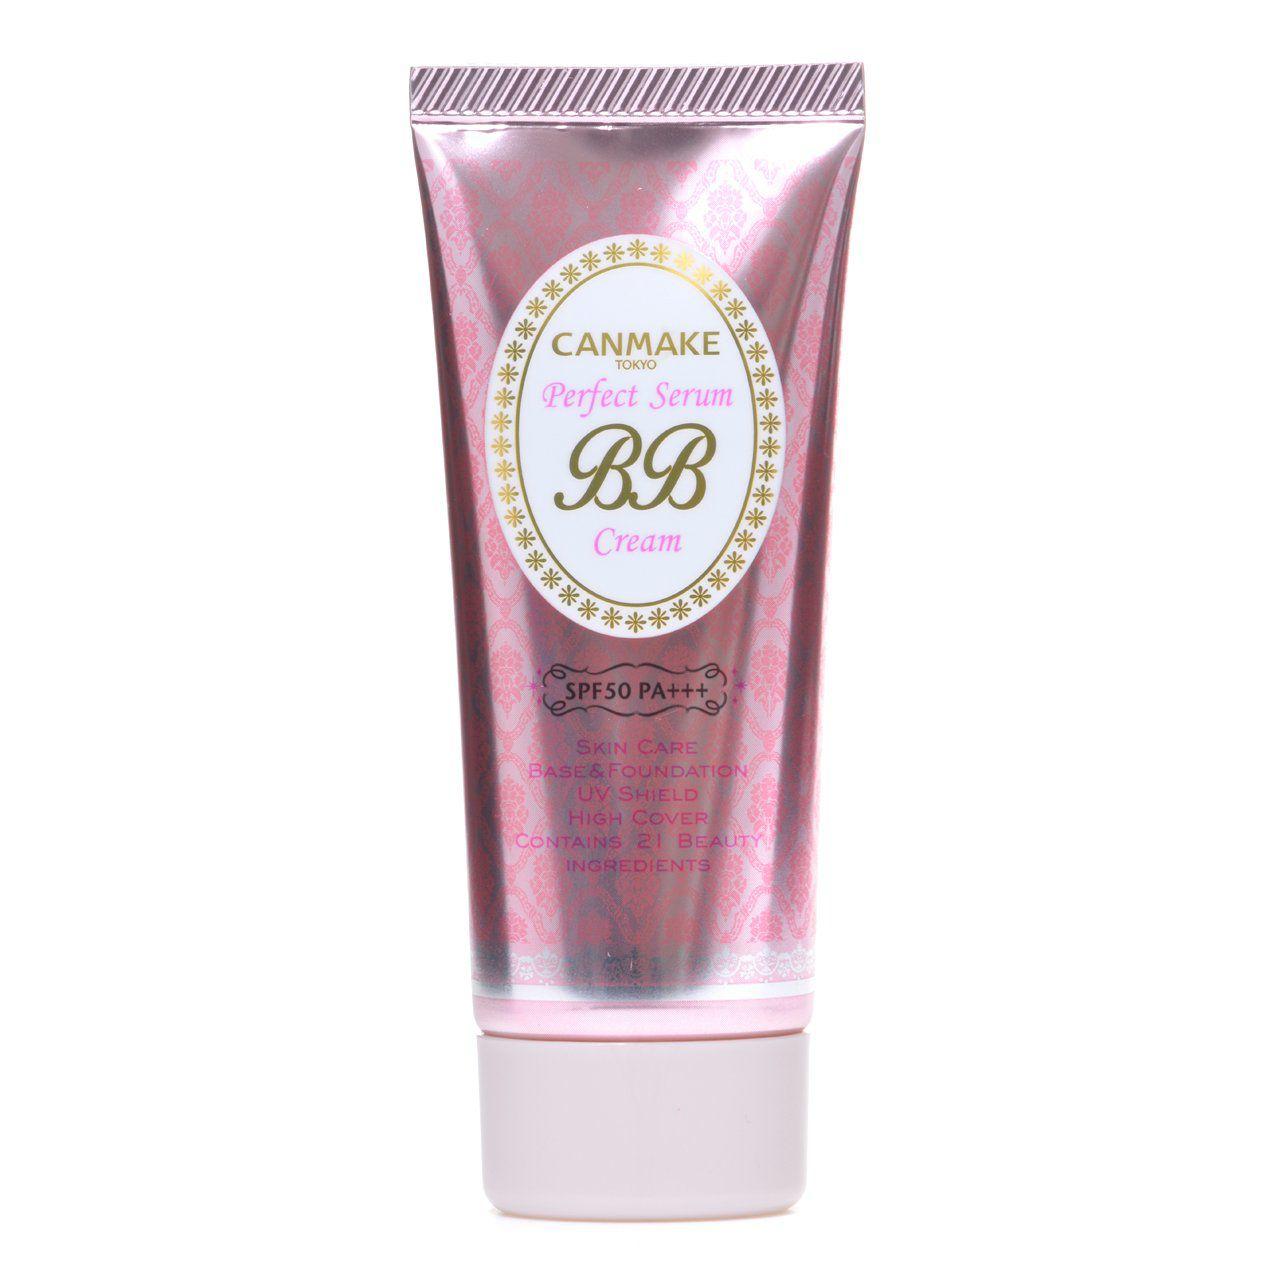 CANMAKE Perfect Serum BB Cream SPF50+ PA+++ 30g